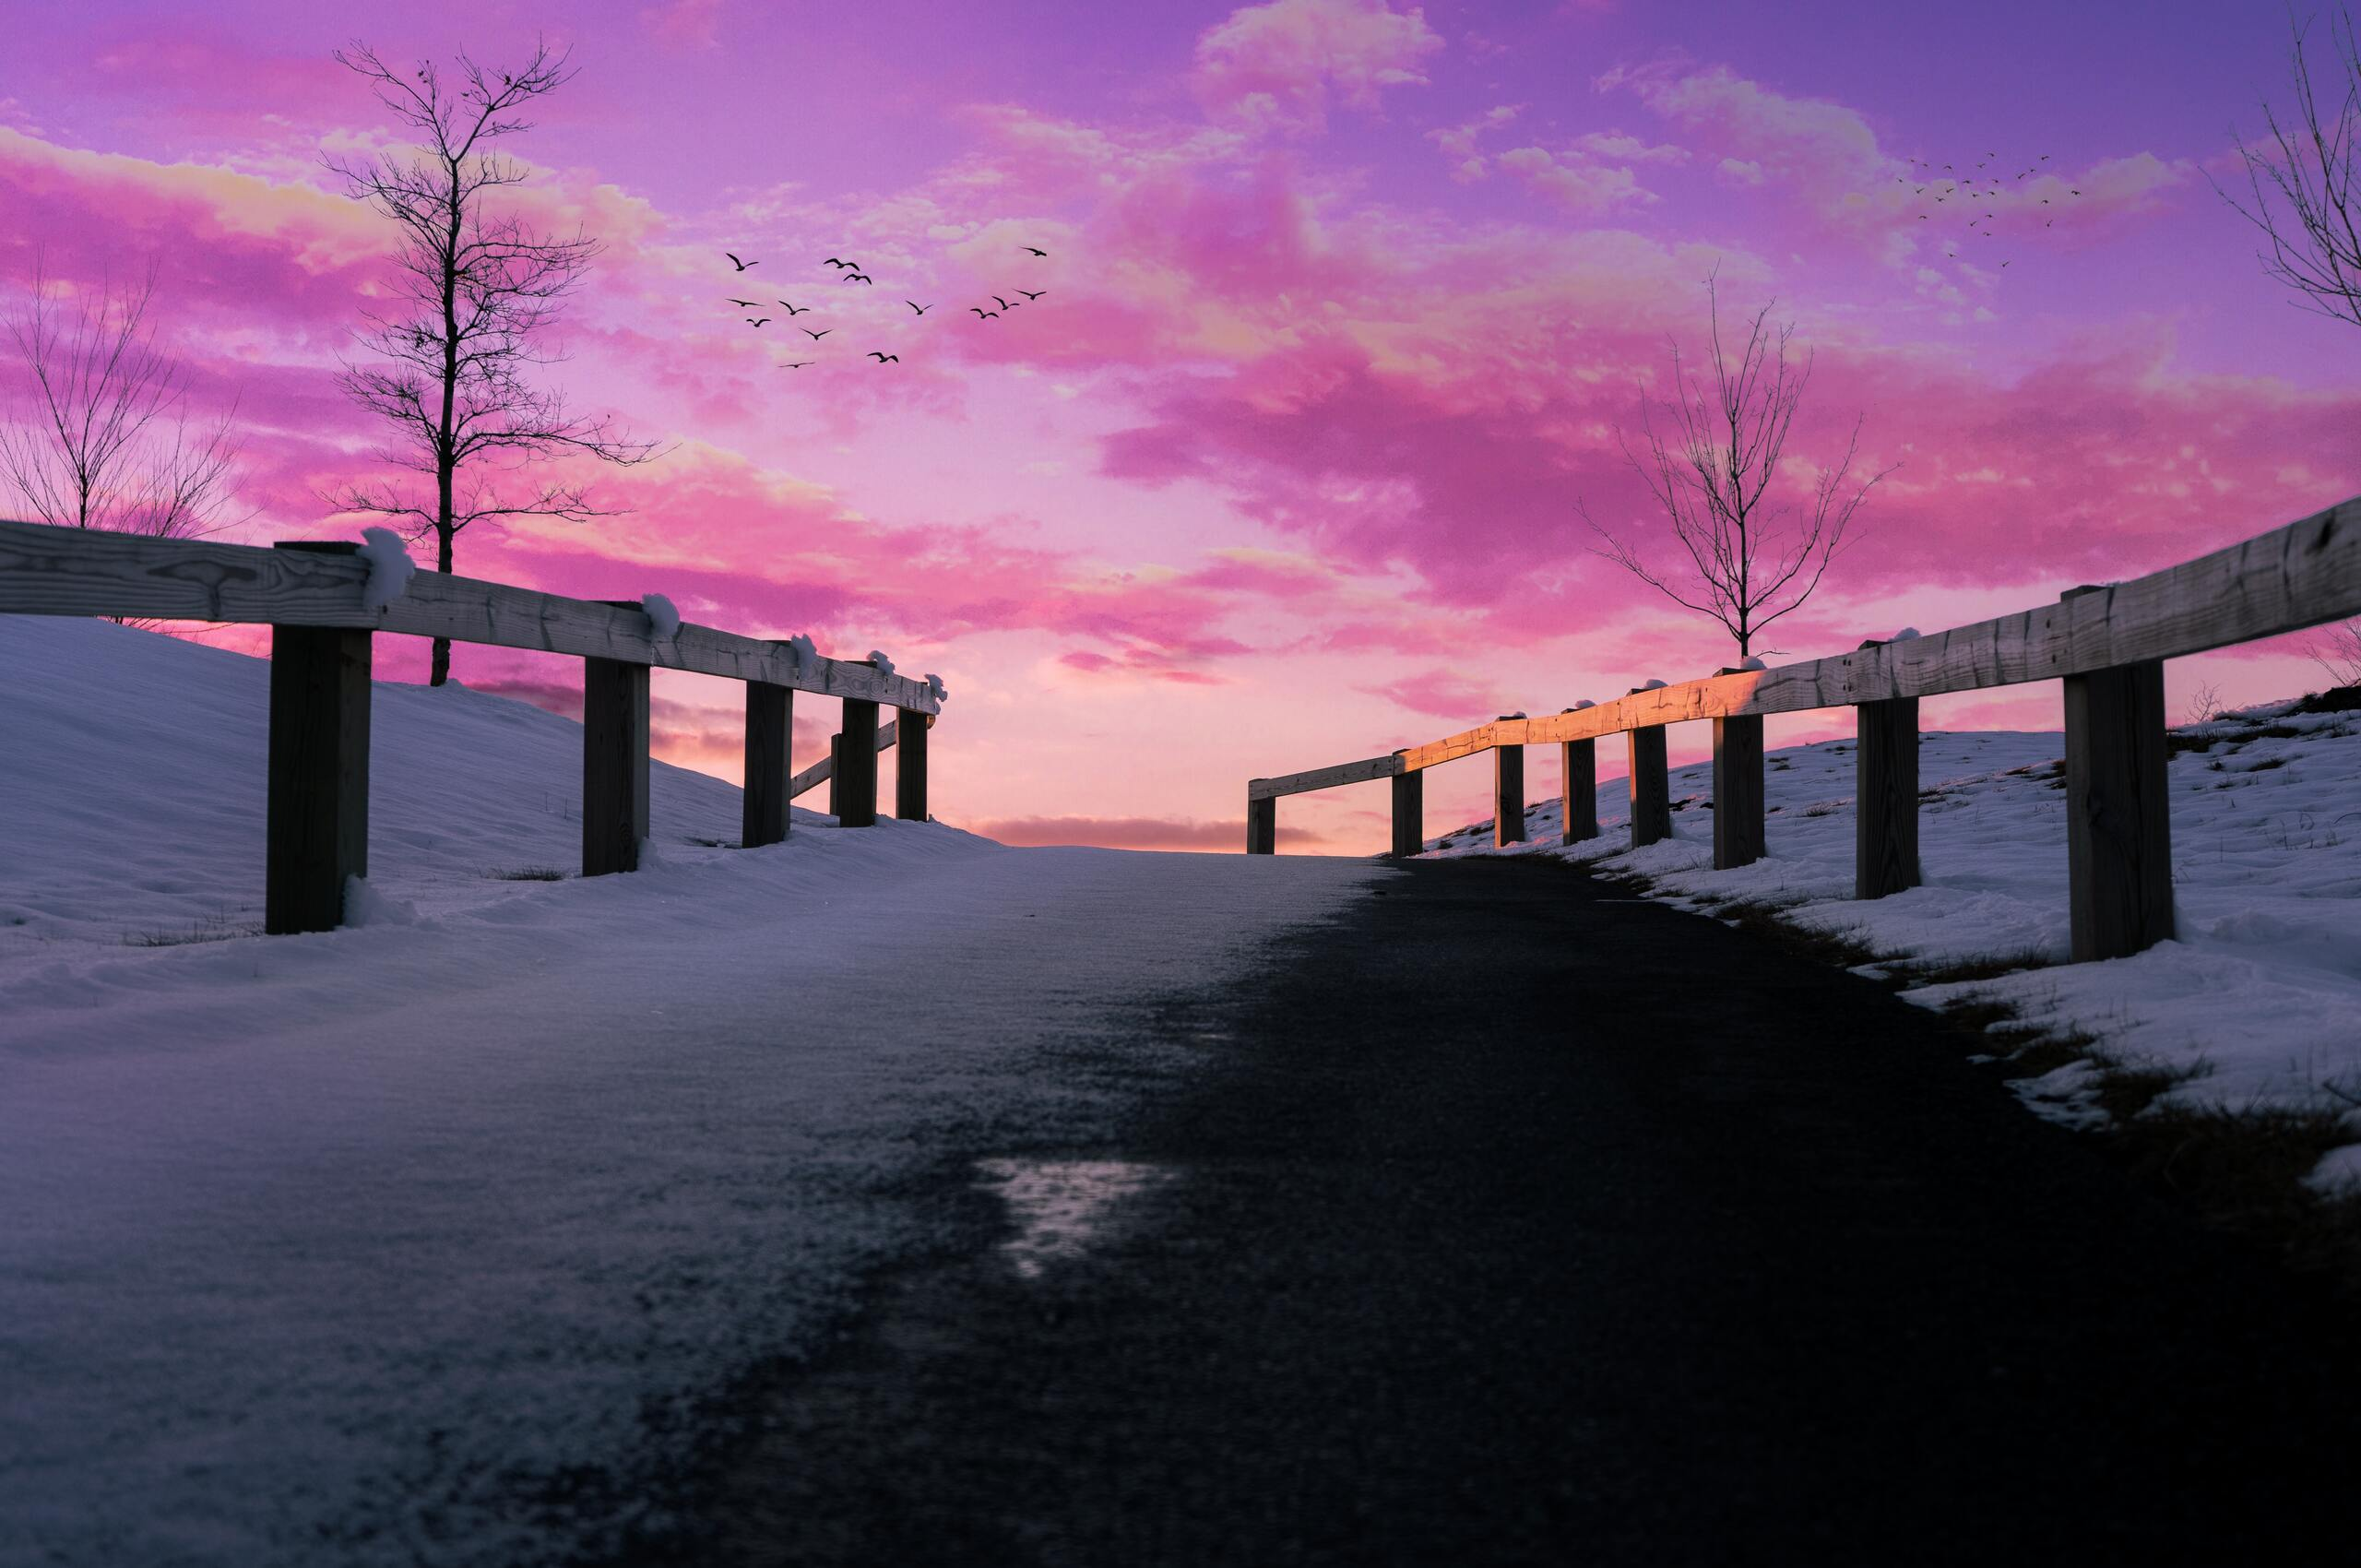 sky aesthetic backgrounds for chromebook